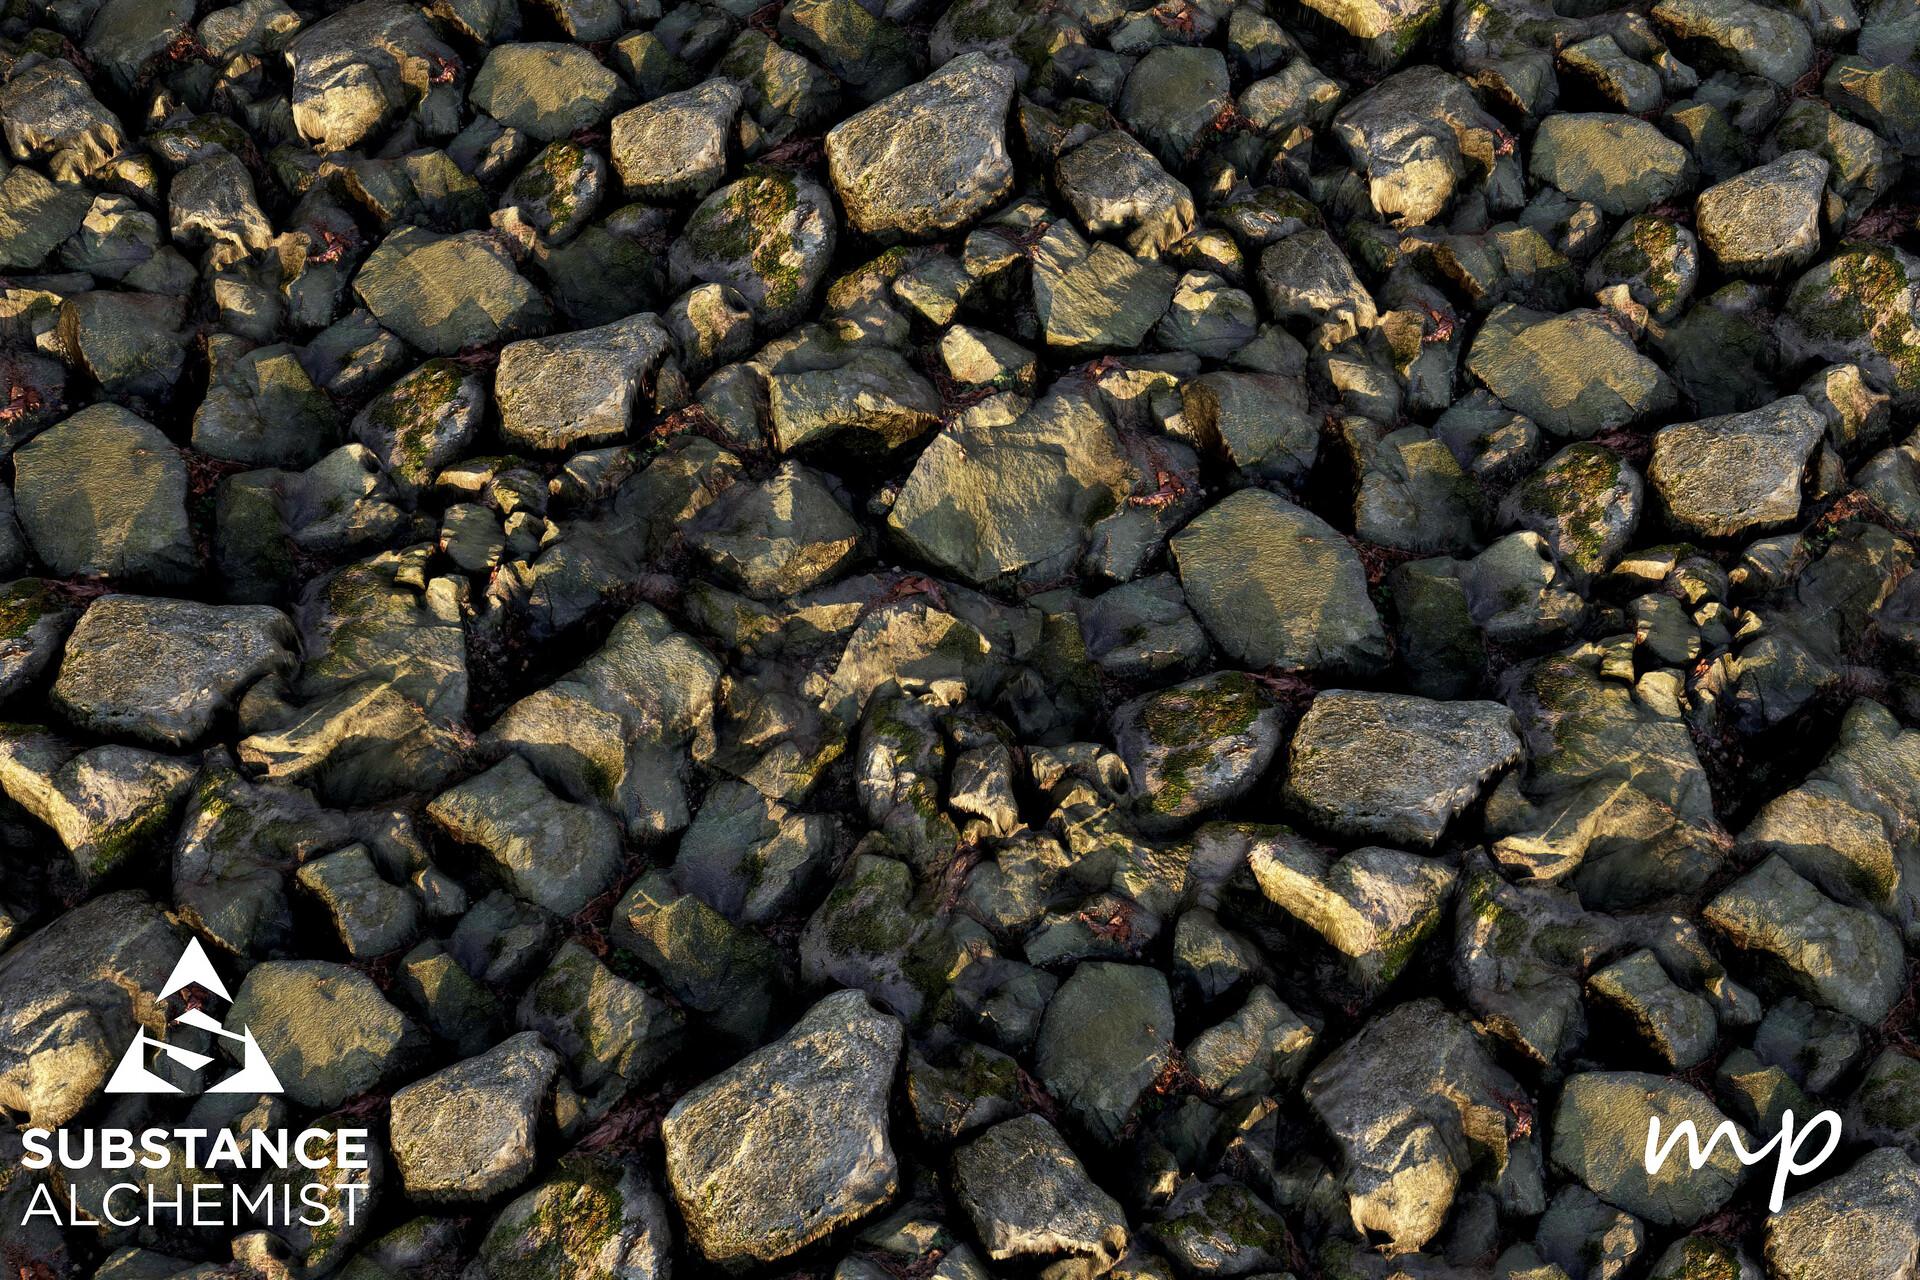 Martin pietras photogrammetry rocks plane 02